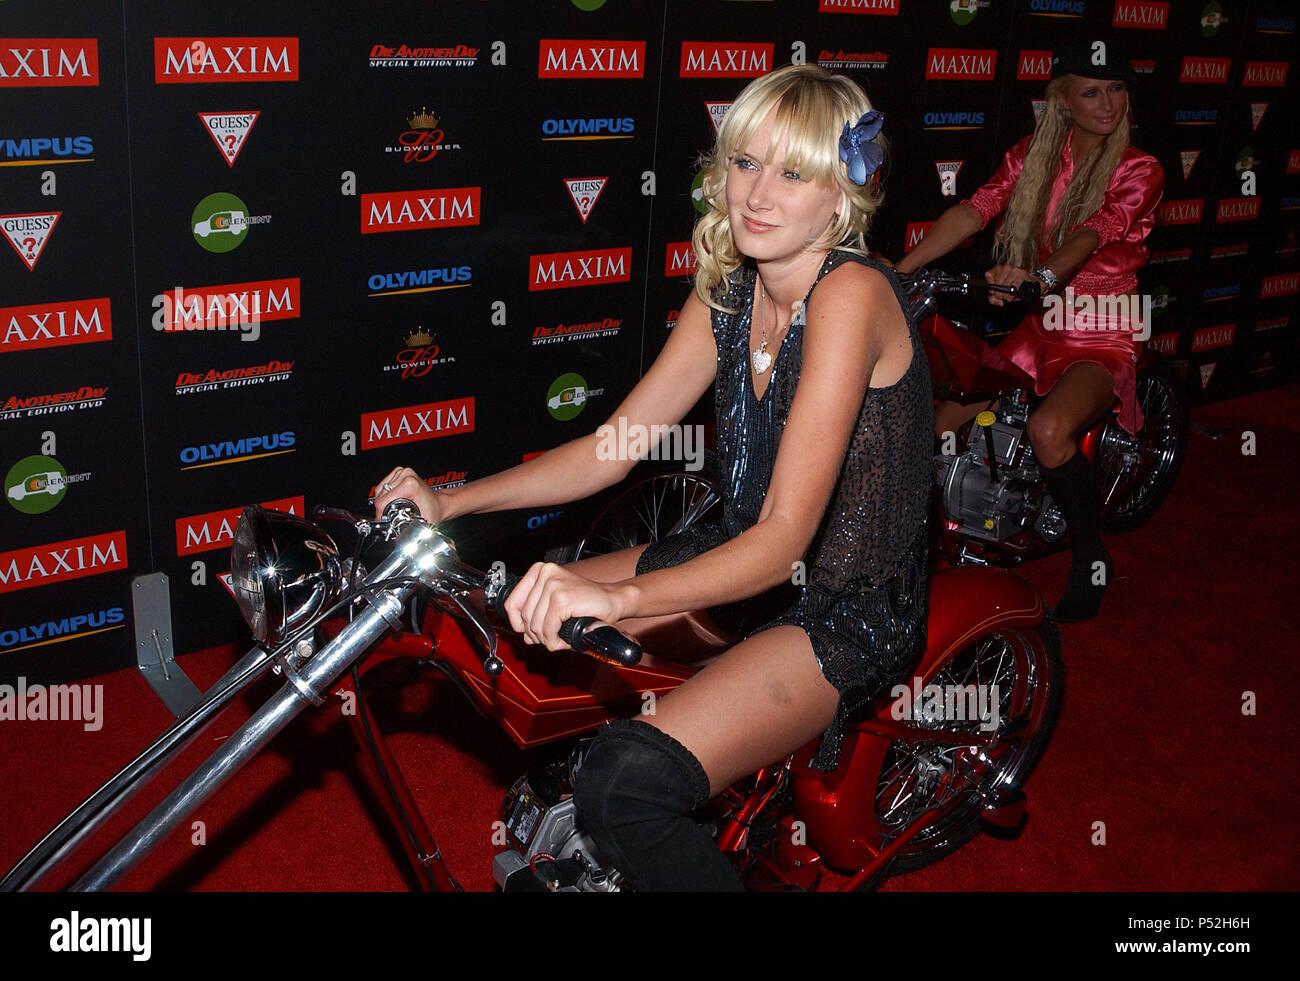 Paris Hilton Maxim Stockfotos Paris Hilton Maxim Bilder